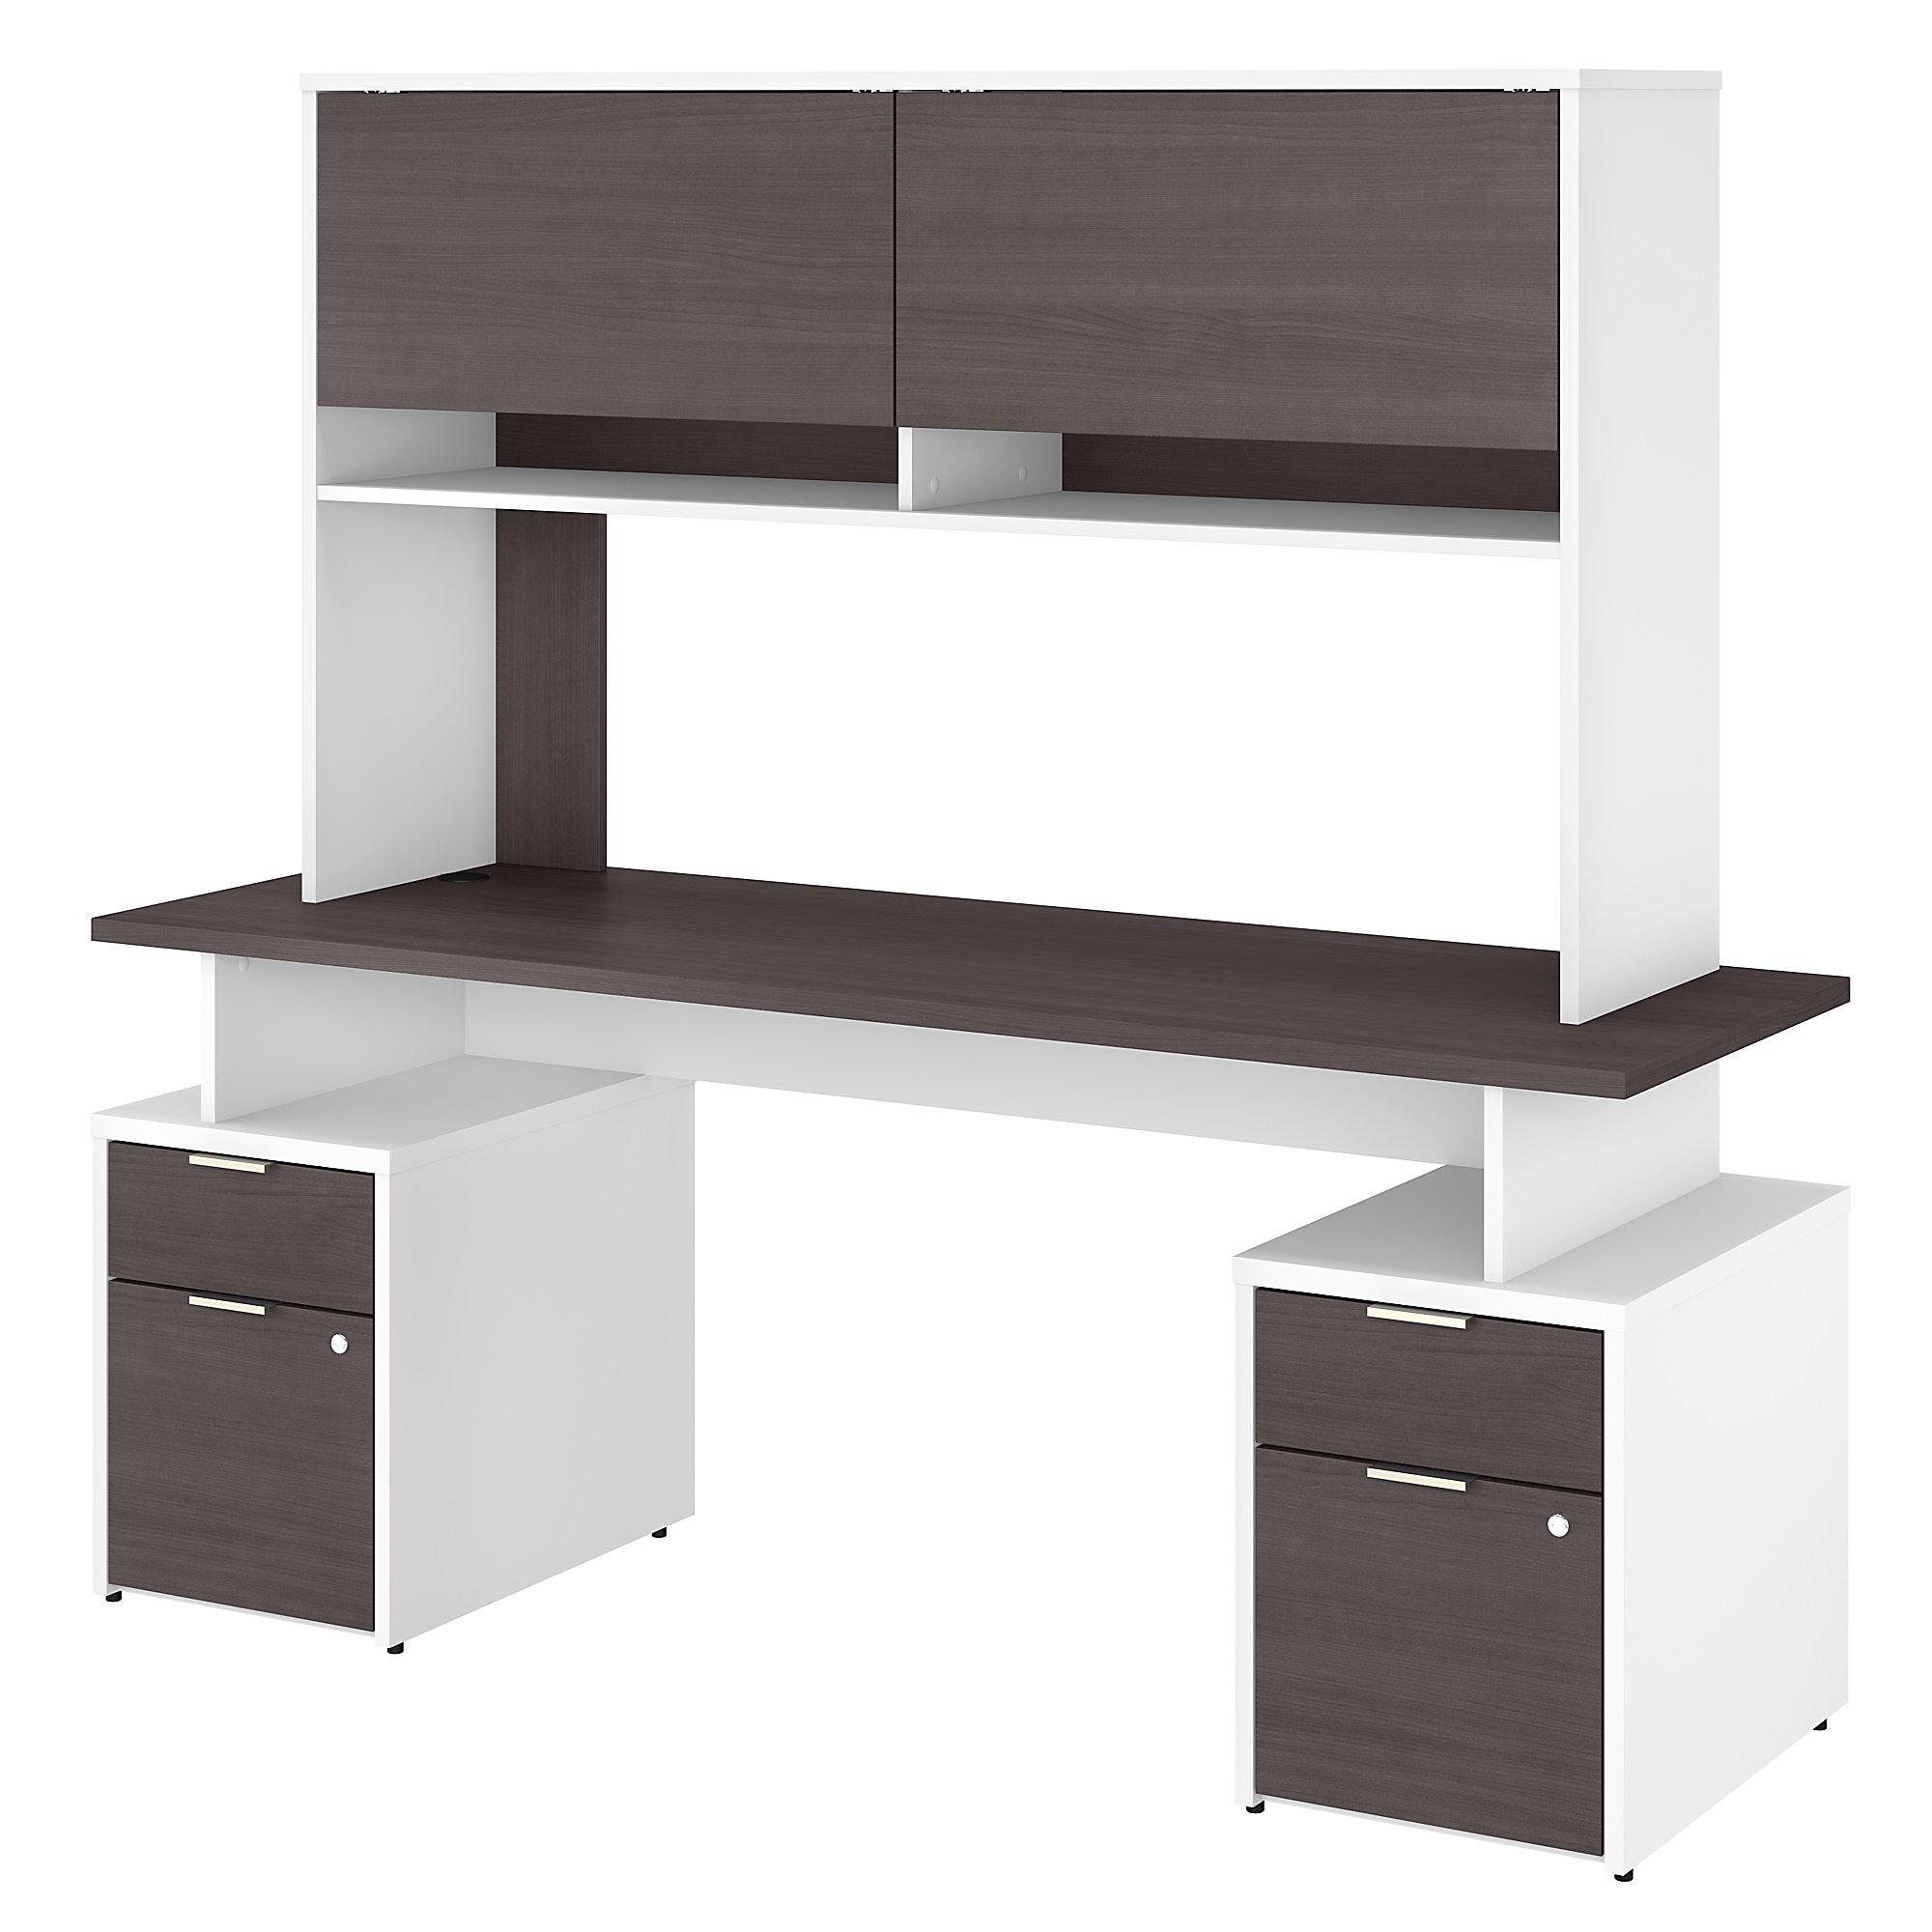 jtn006 storm gray and white jamestown desk